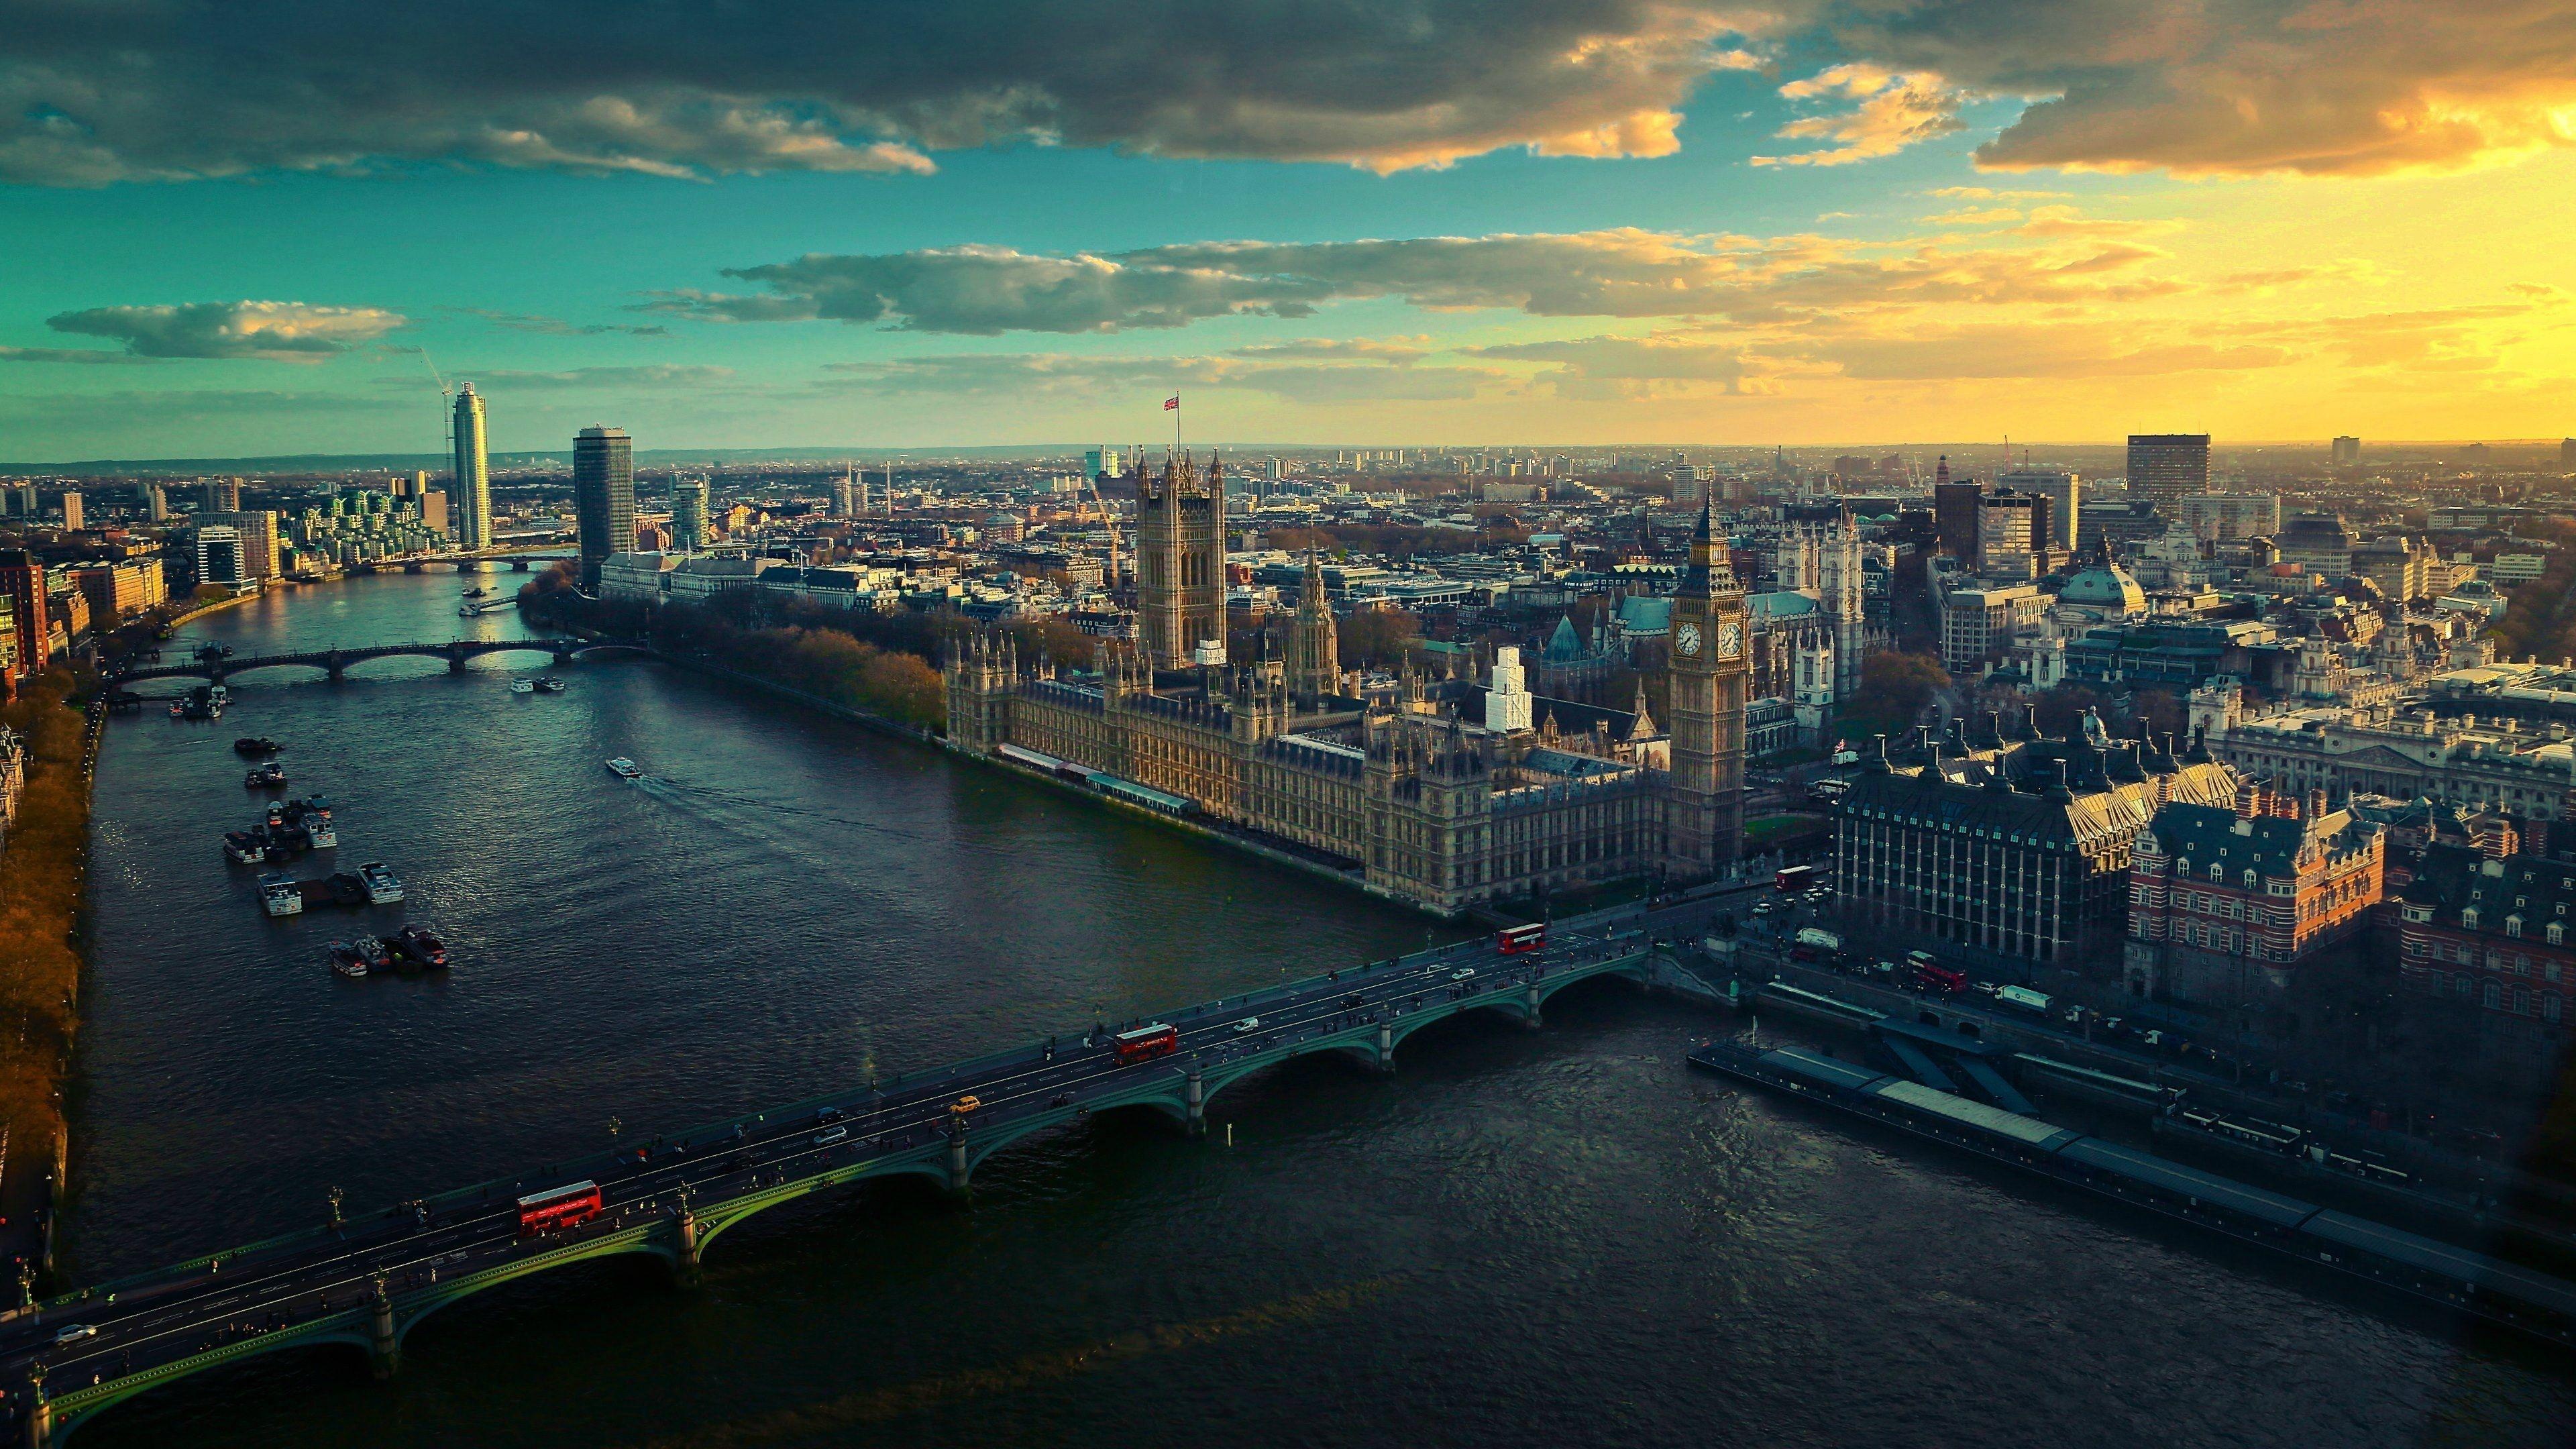 london 1920x1080, london hd